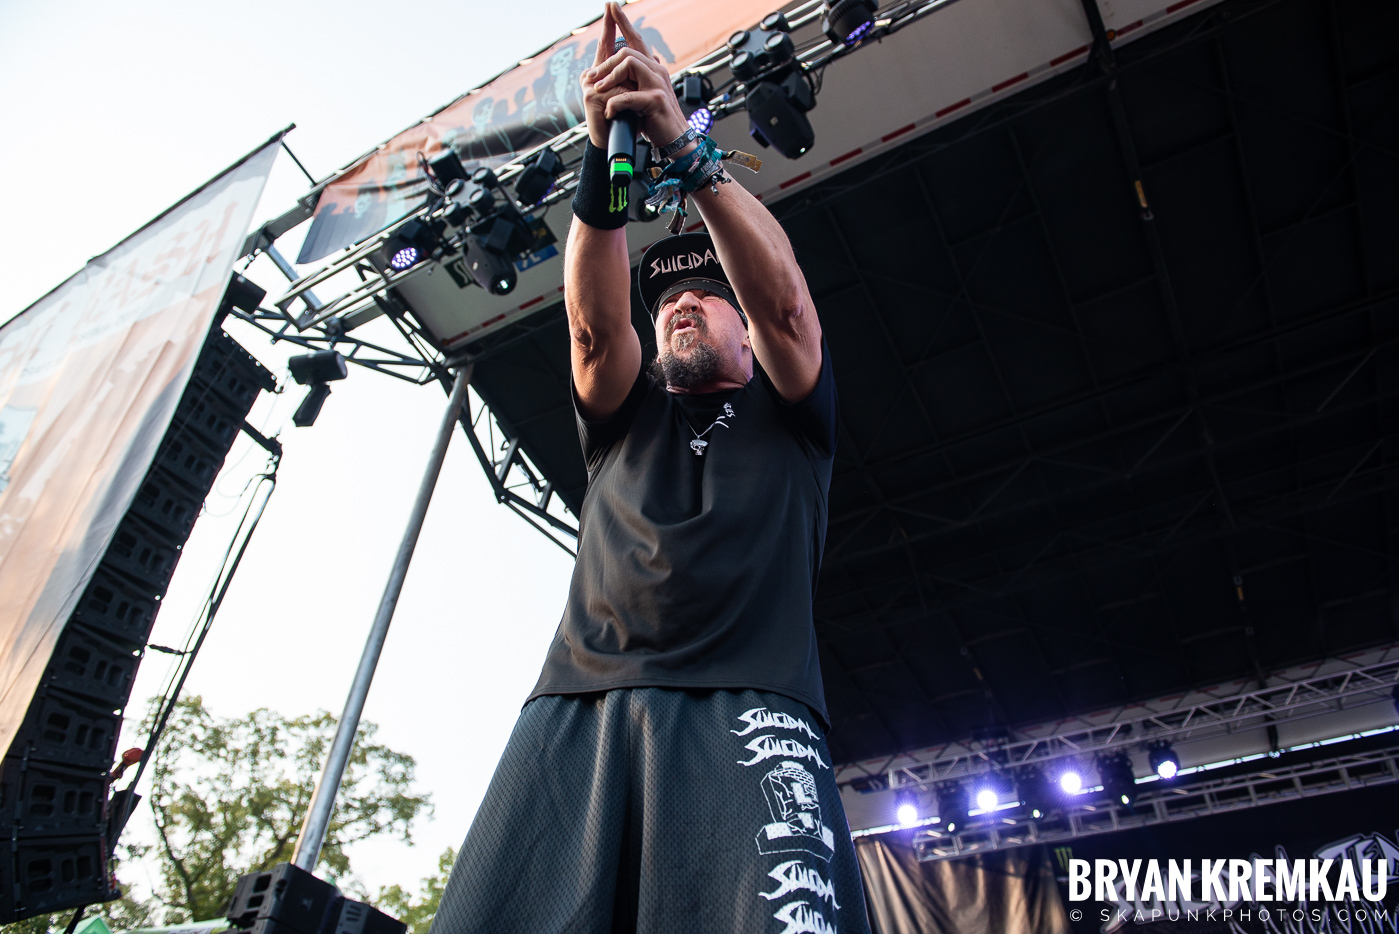 Suicidal Tendencies @ The Bash Music & Craft Beer Festival, Old Bridge Township Raceway Park, Englishtown, NJ - 6.2.19 (6)